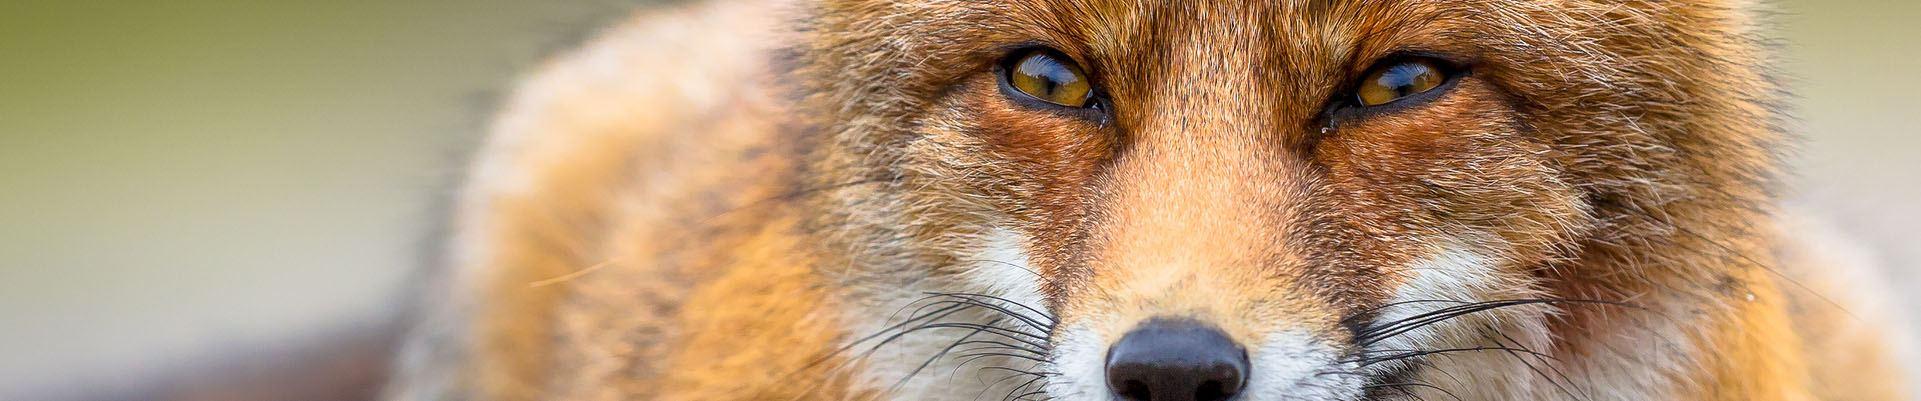 Fox Management in Hampshire